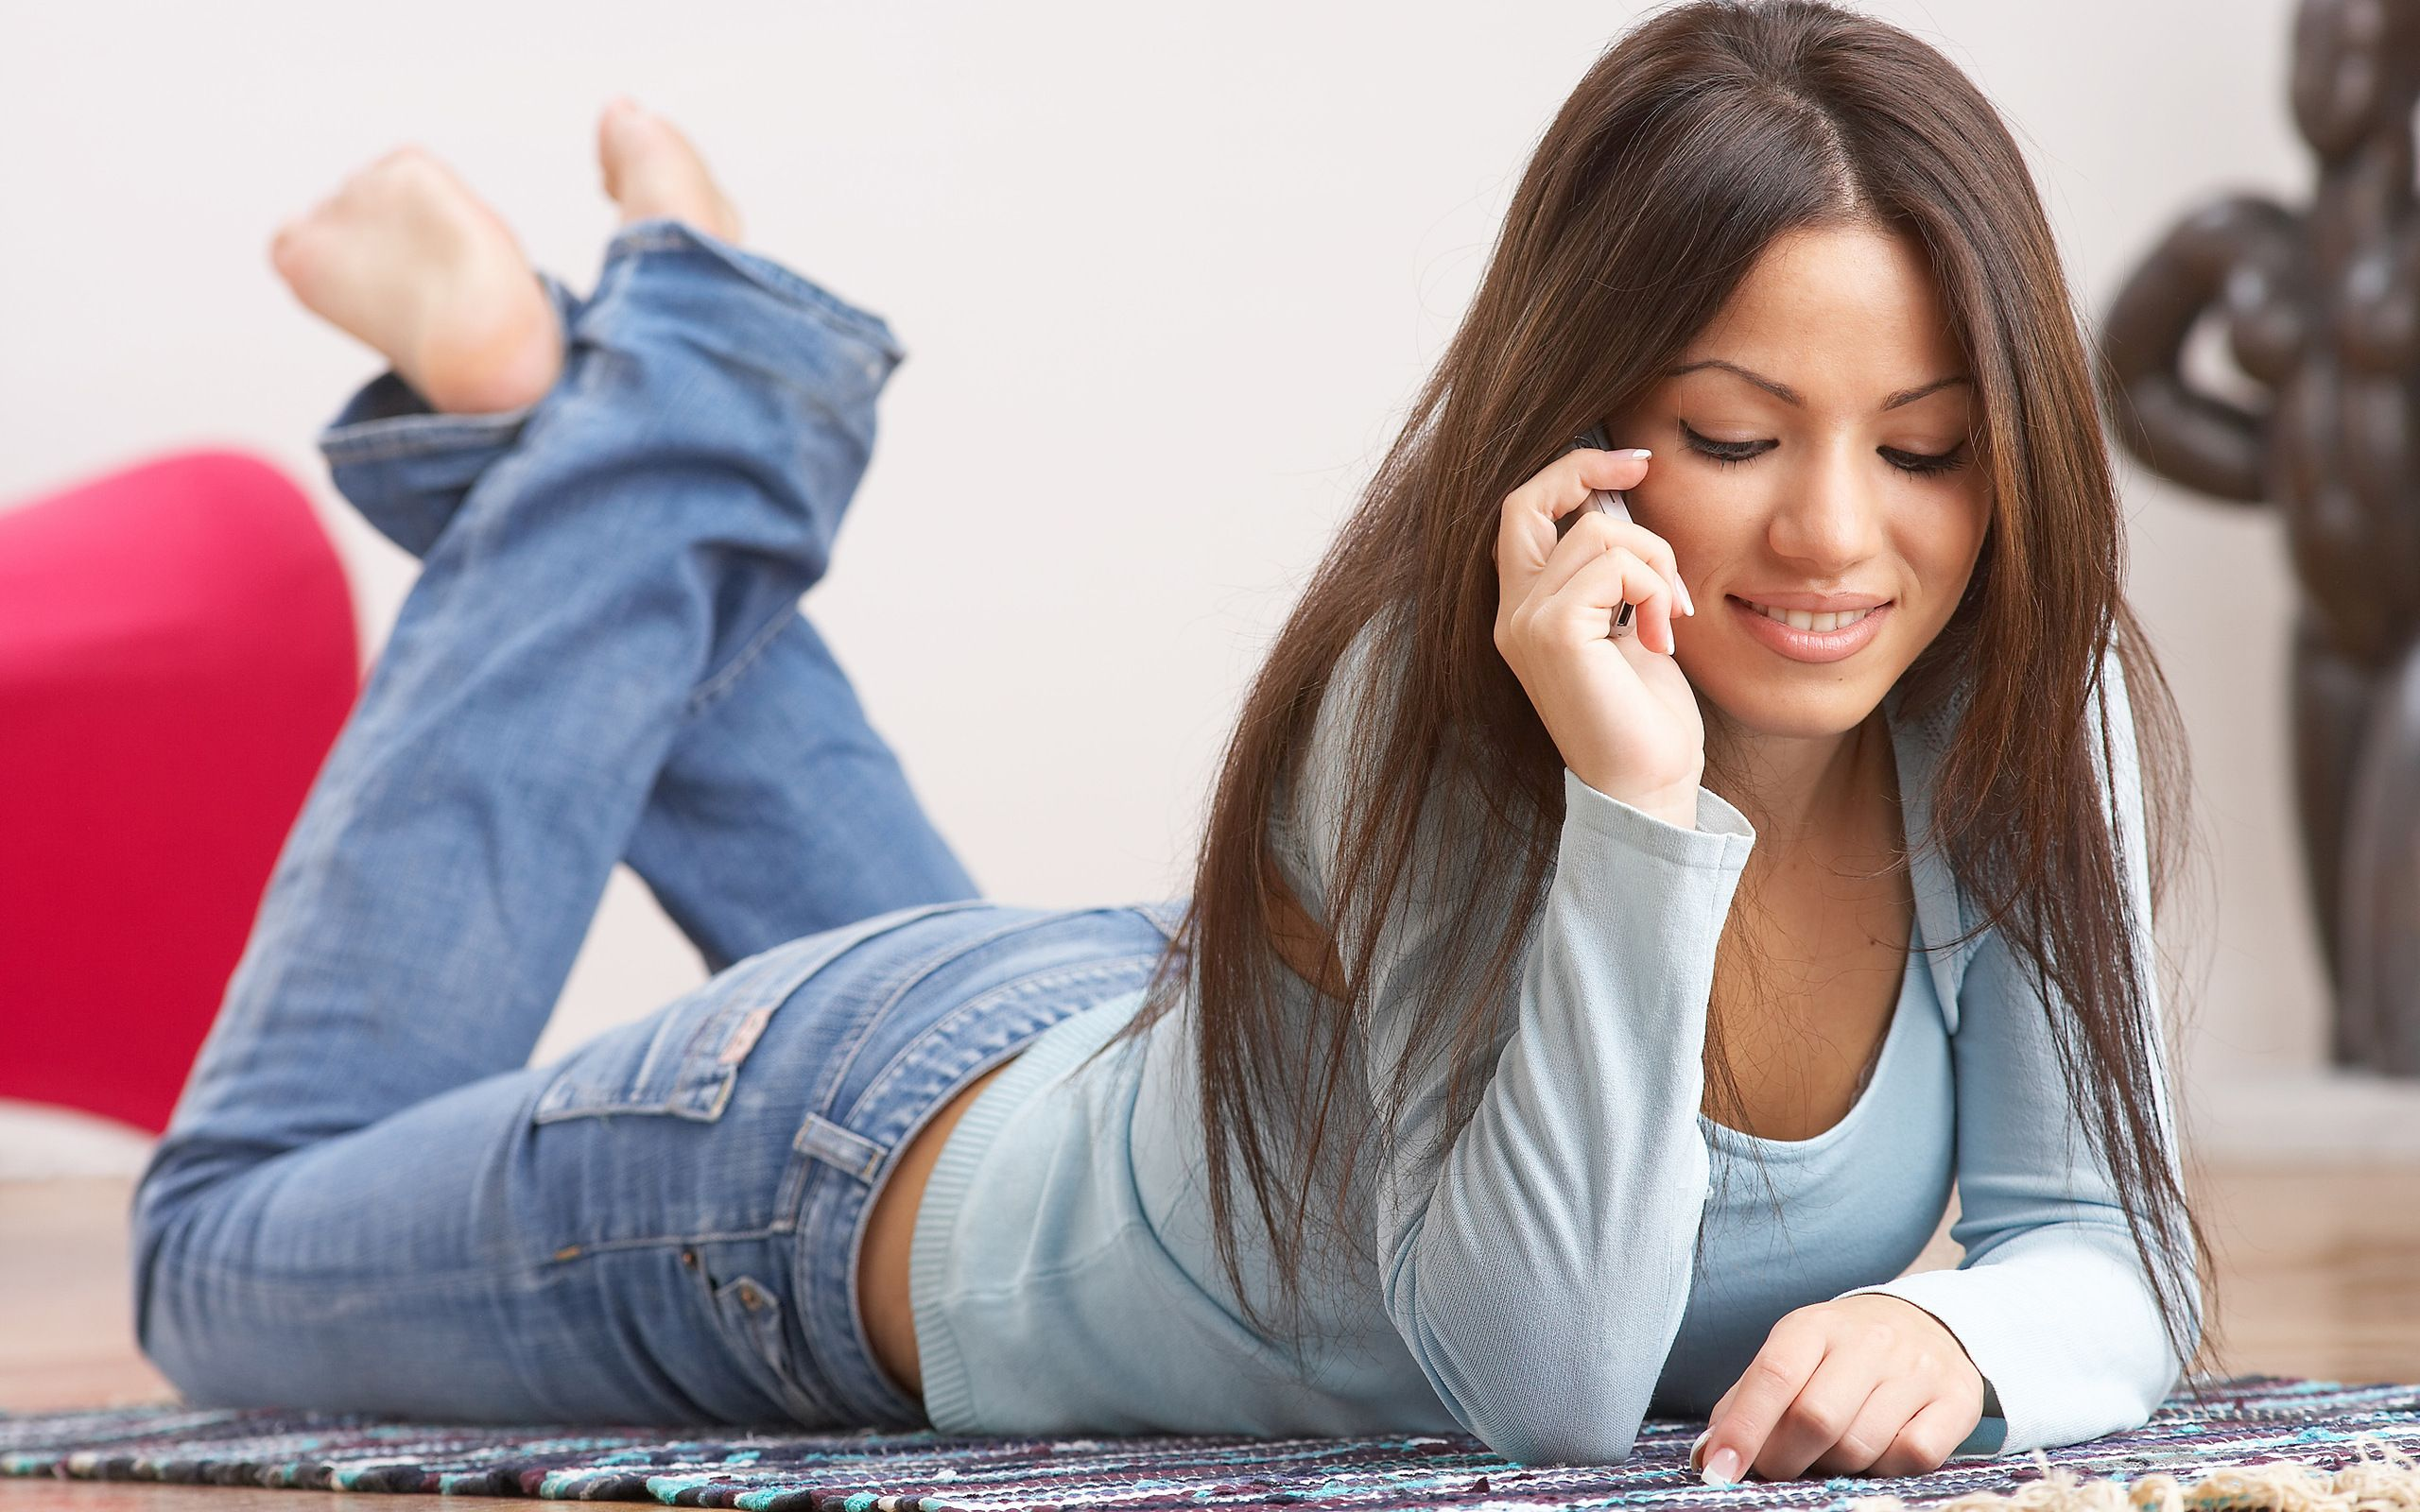 Wallpaper <b>Girl</b> <b>Barefoot</b> In <b>Jeans</b> And A Blue ...